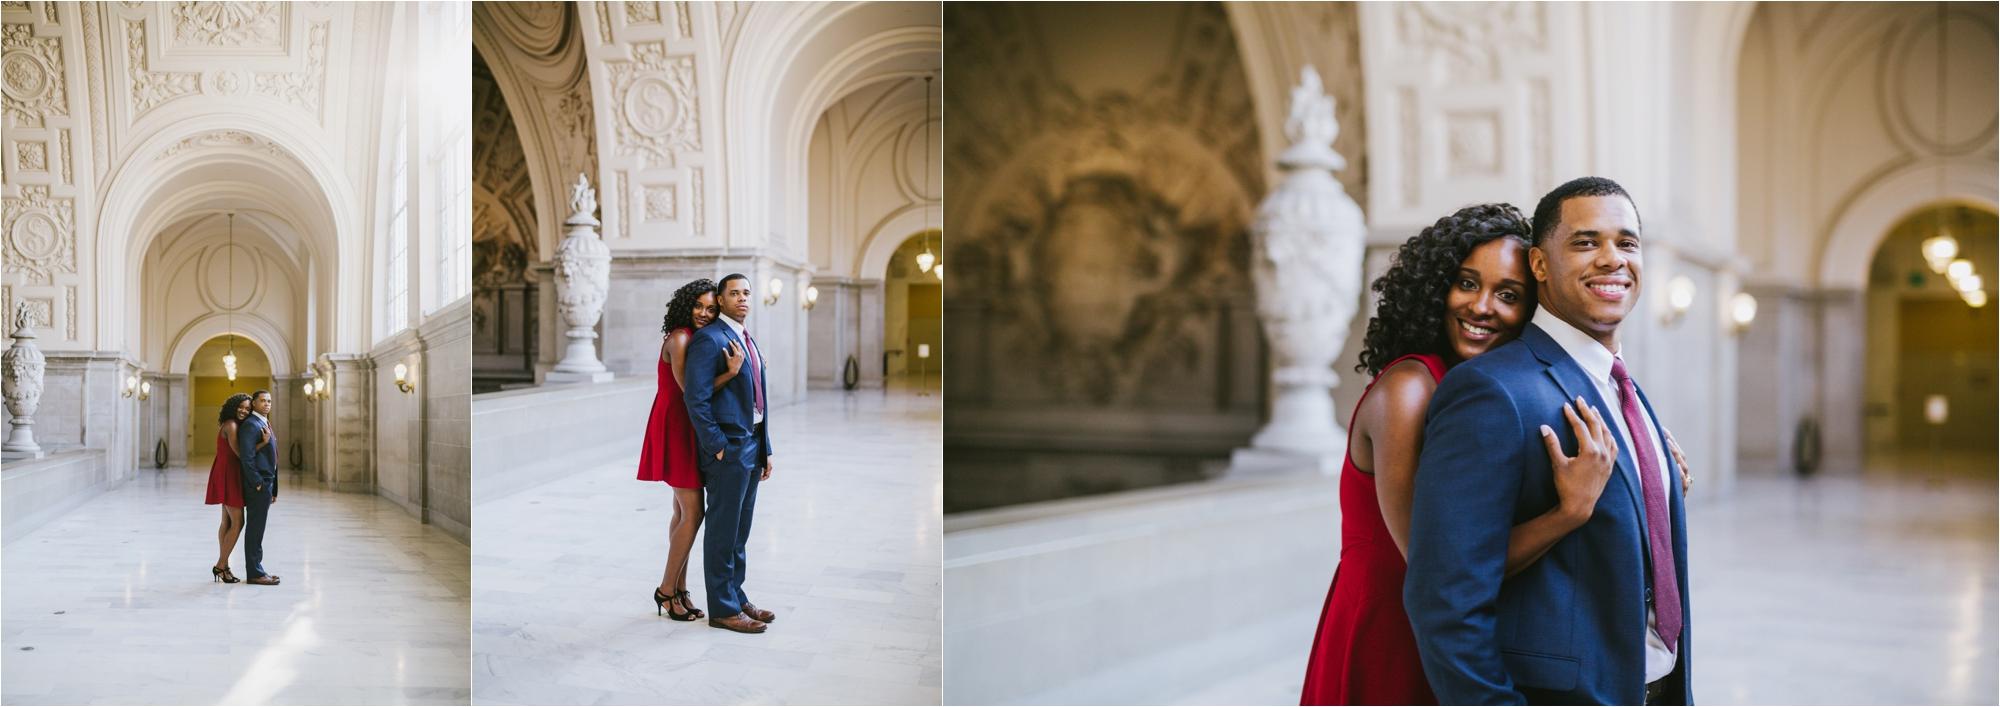 los angeles international destination wedding photographer